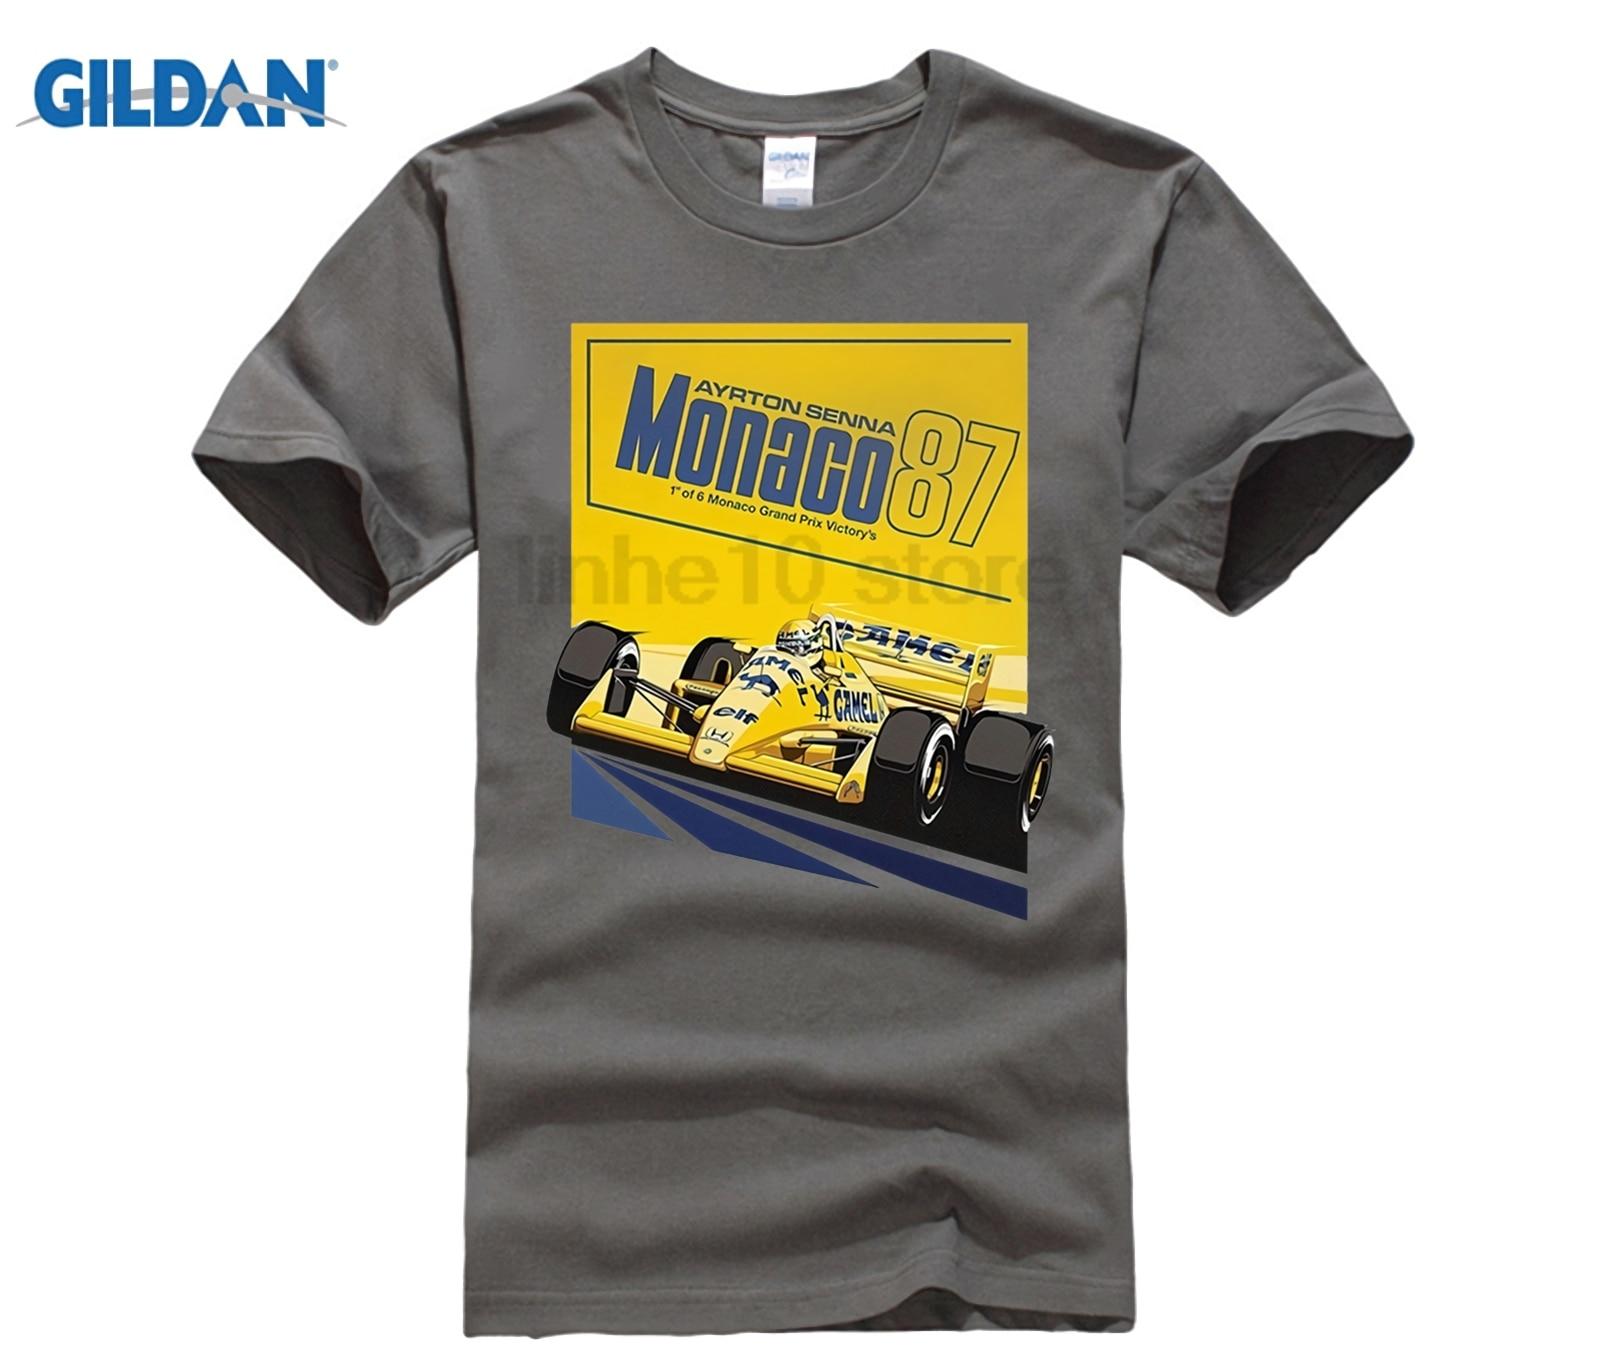 GILDAN New Arrival Ayrton Senna 87 Poster Tops T Shirt 1 Car Men Round Collar Short Sleeve T-Shirts